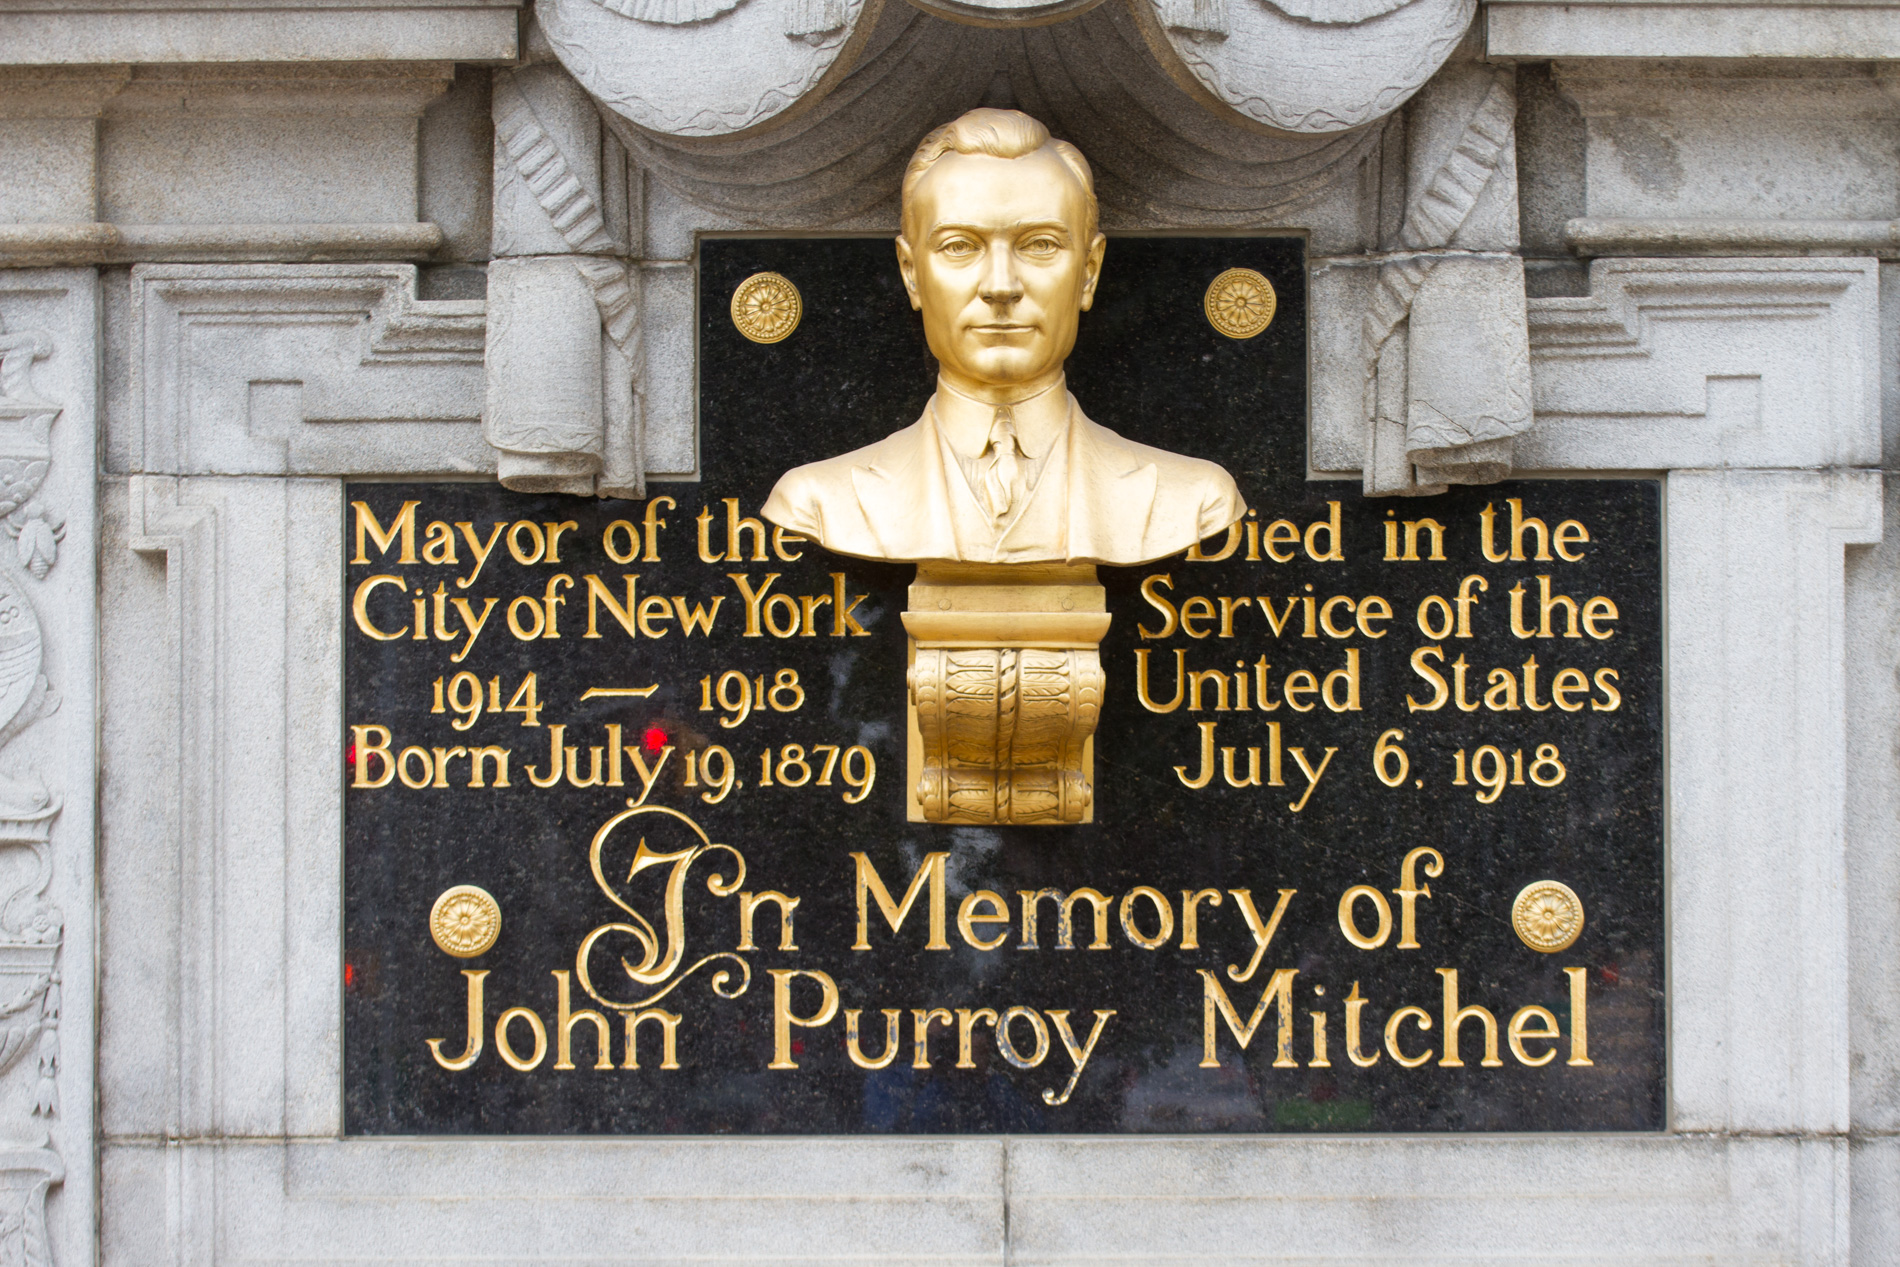 John Purroy Mitchel Memorial [4303]